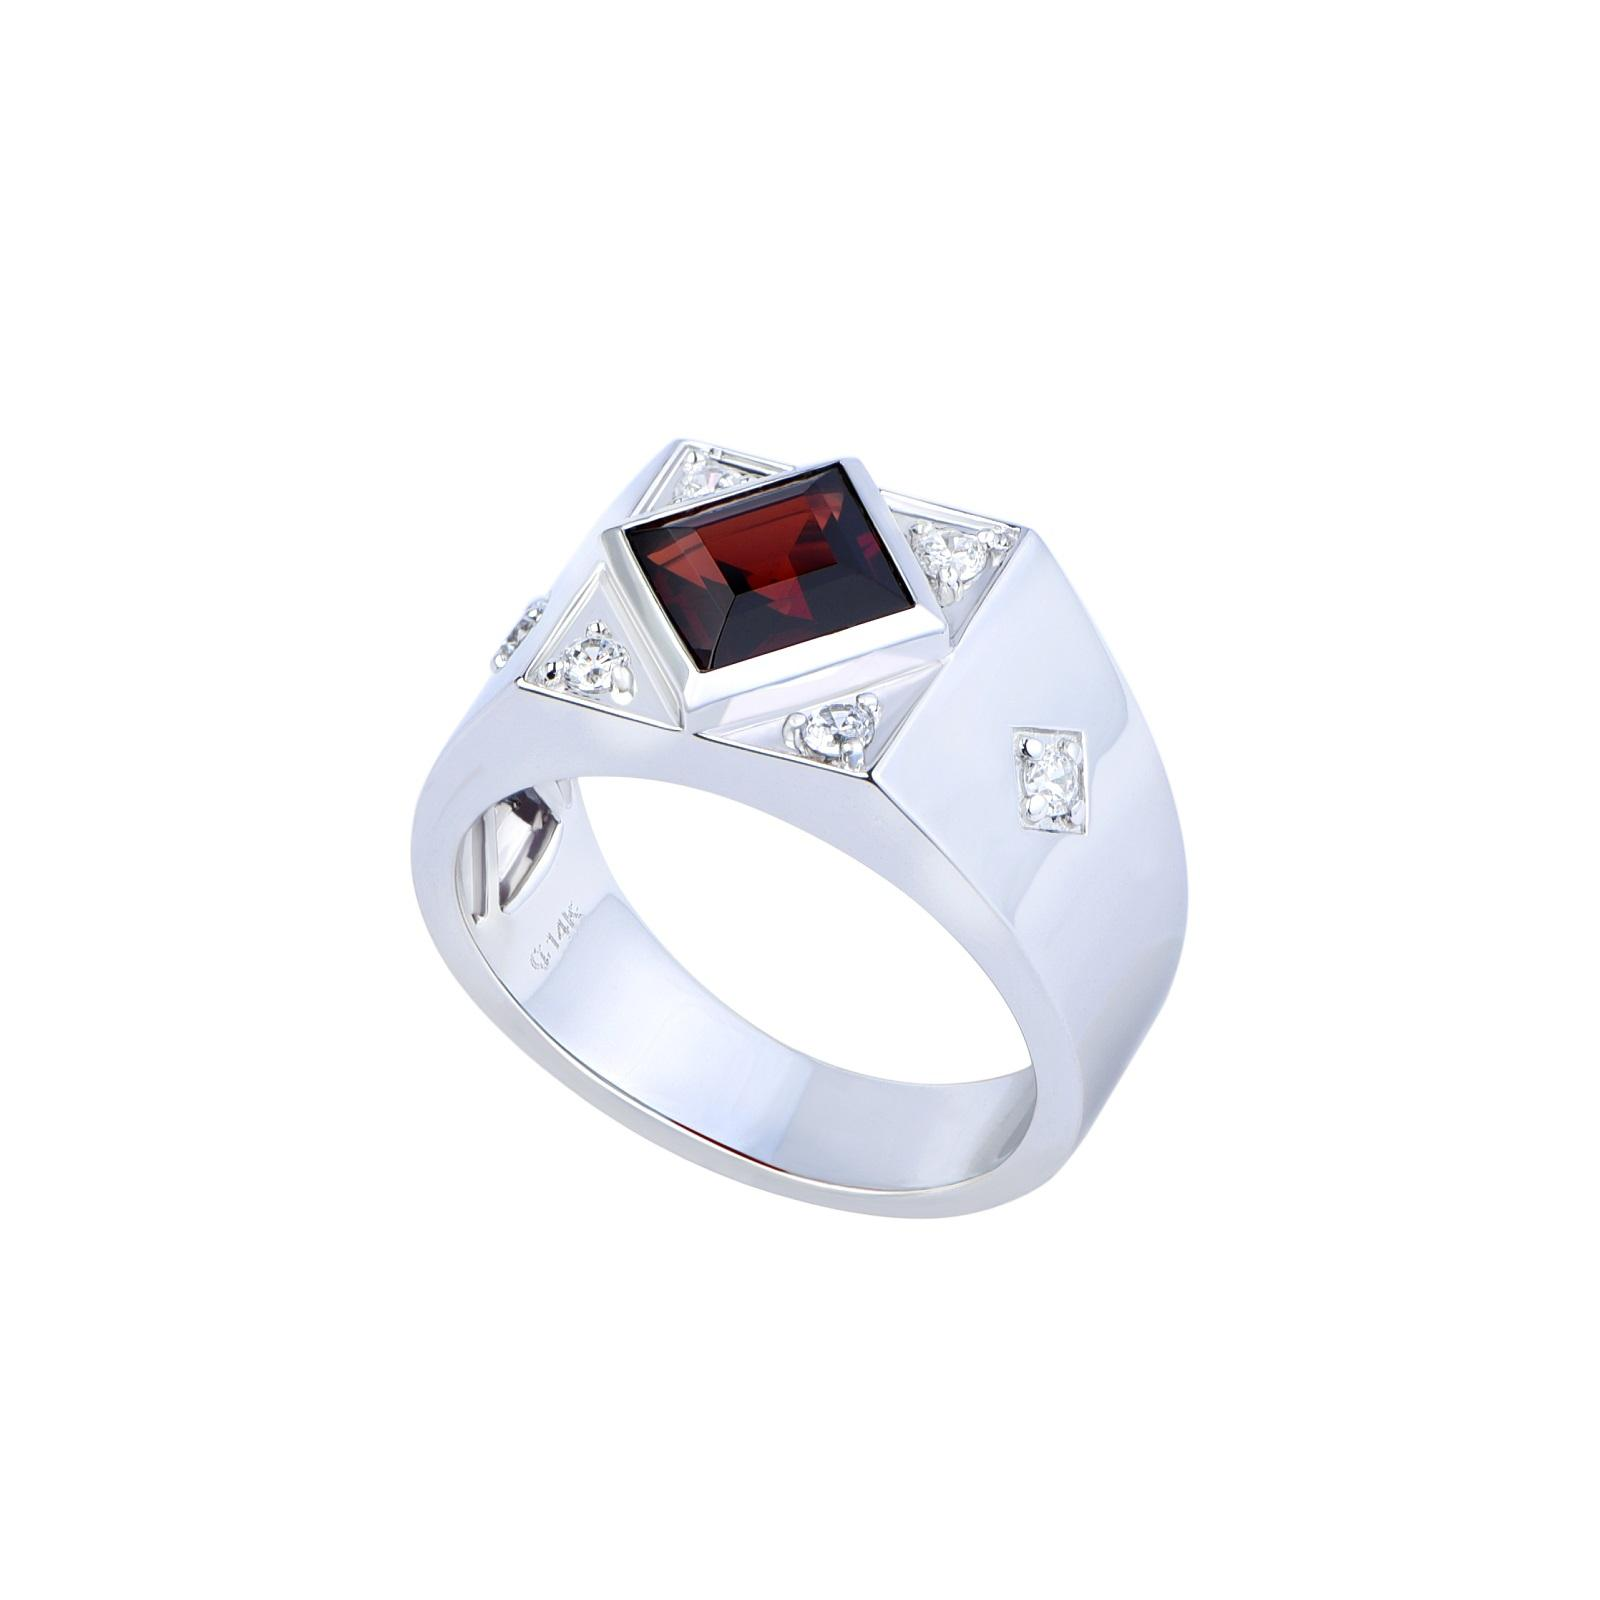 Nhẫn nam đá Garnet 21NN038